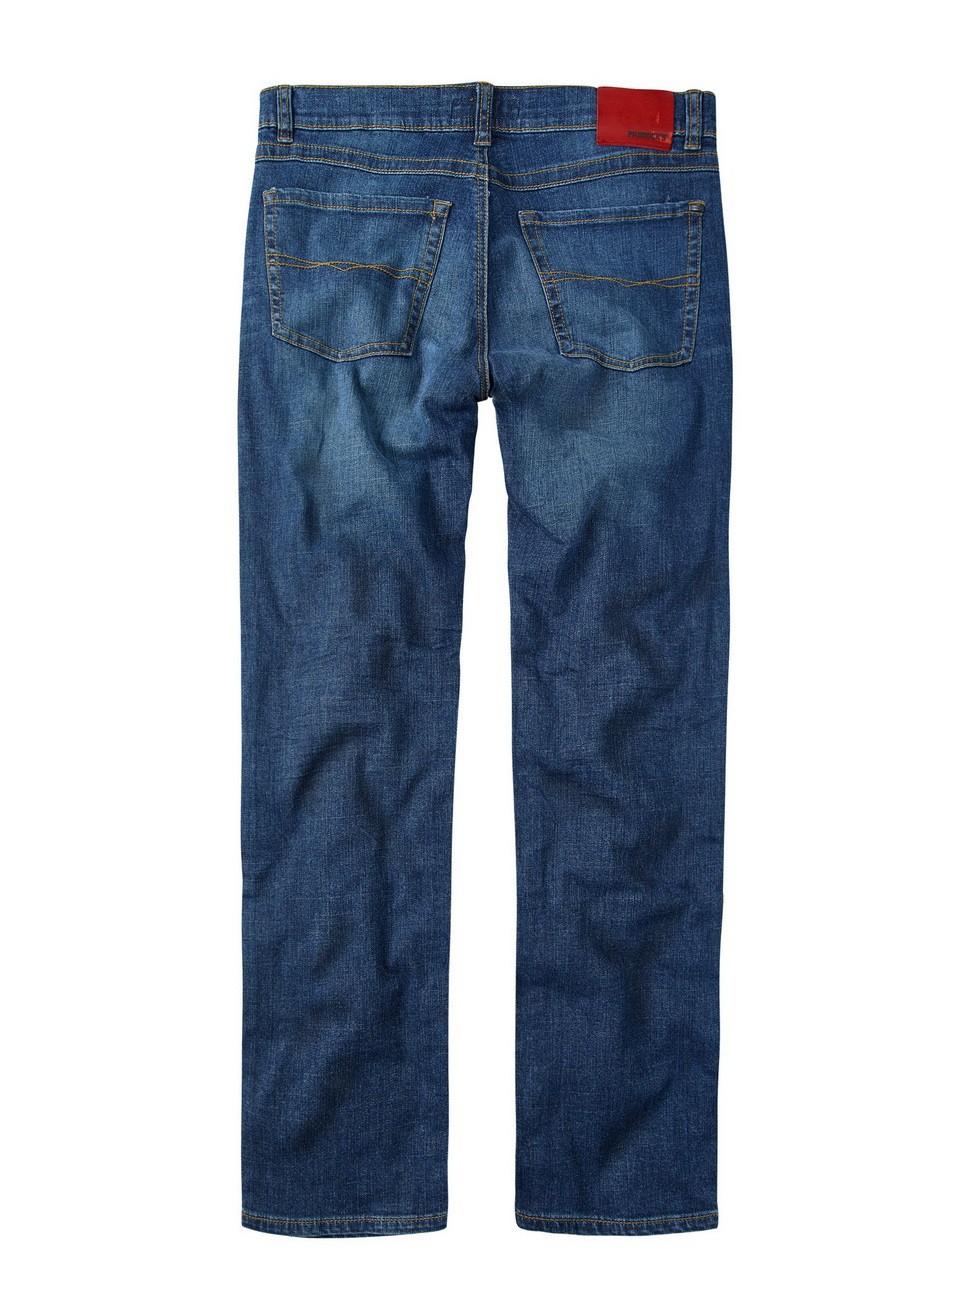 Paddock`s Herren Jeans Carter - Regular Fit - Blau - Blue Dark Stone Used